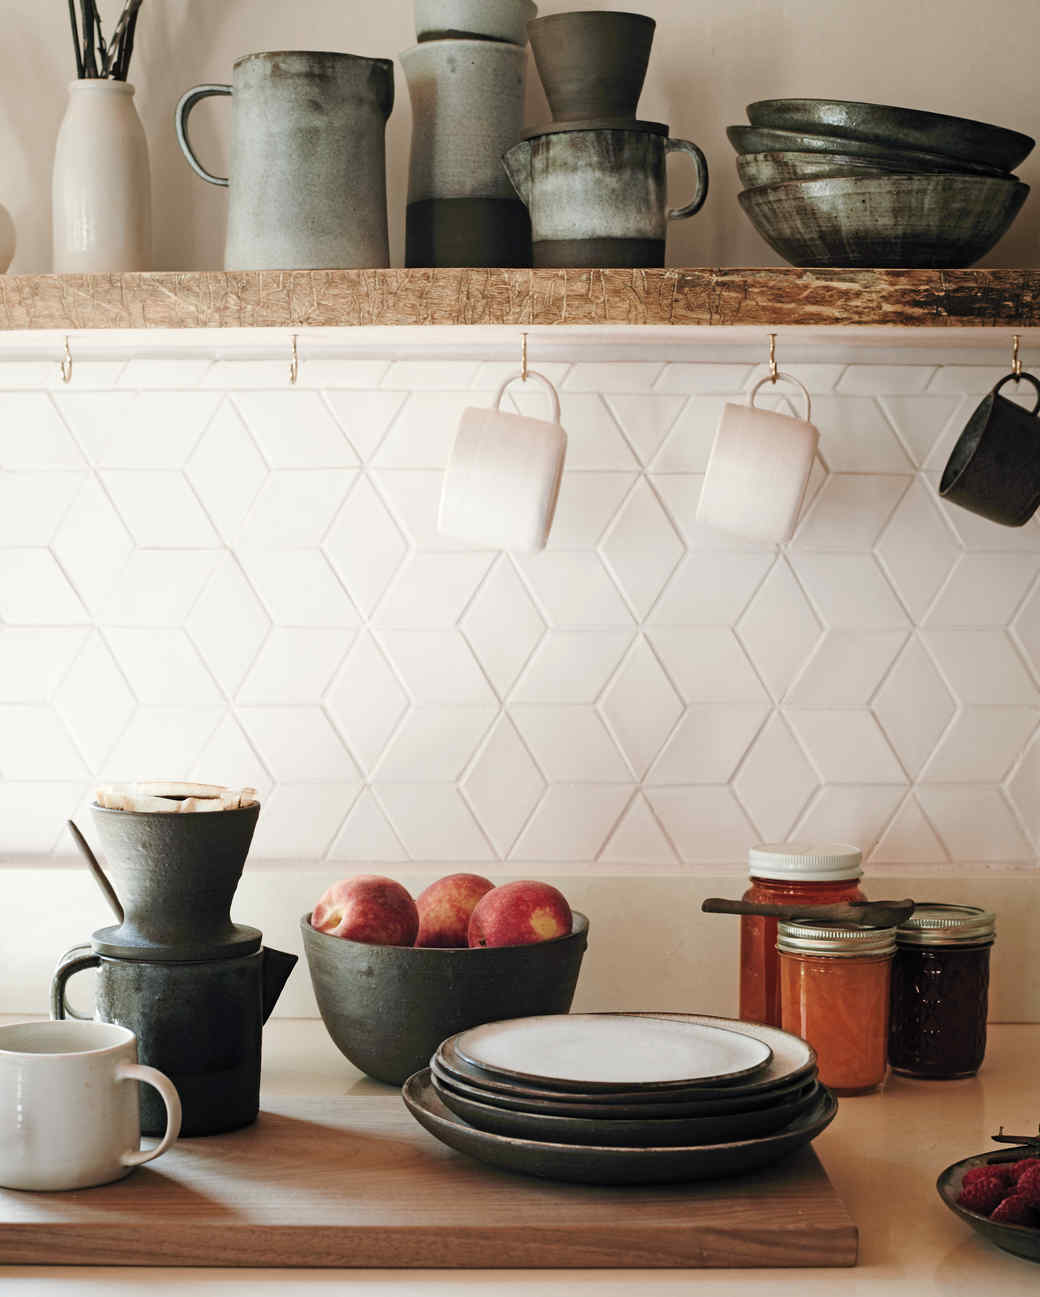 kelli-cain-ceramicist-home-0148-d112172.jpg